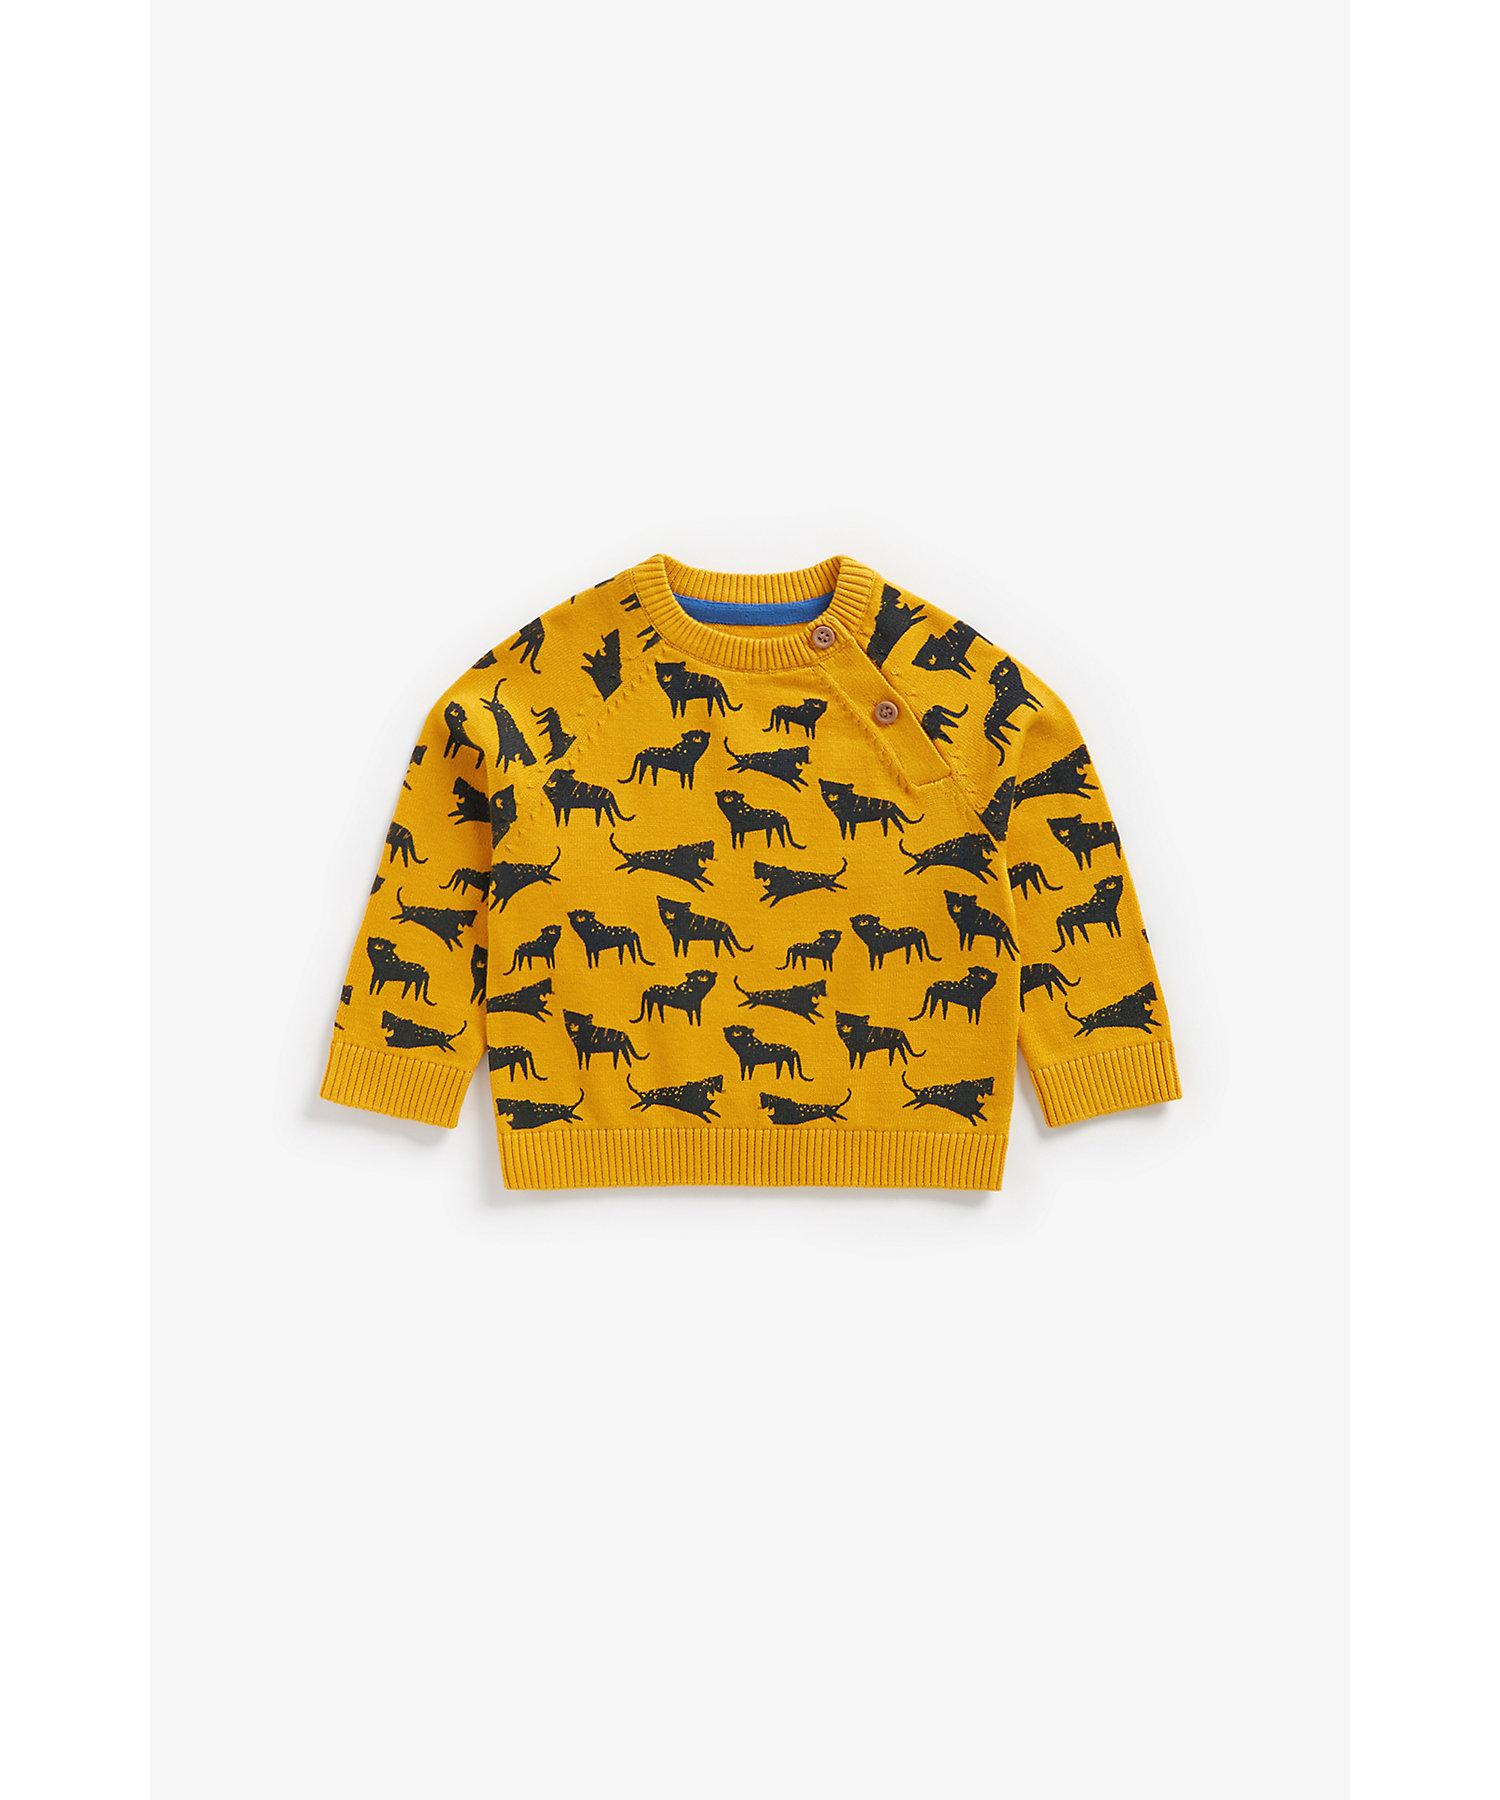 Mothercare | Boys Full Sleeves Sweater Leopard Design - Mustard